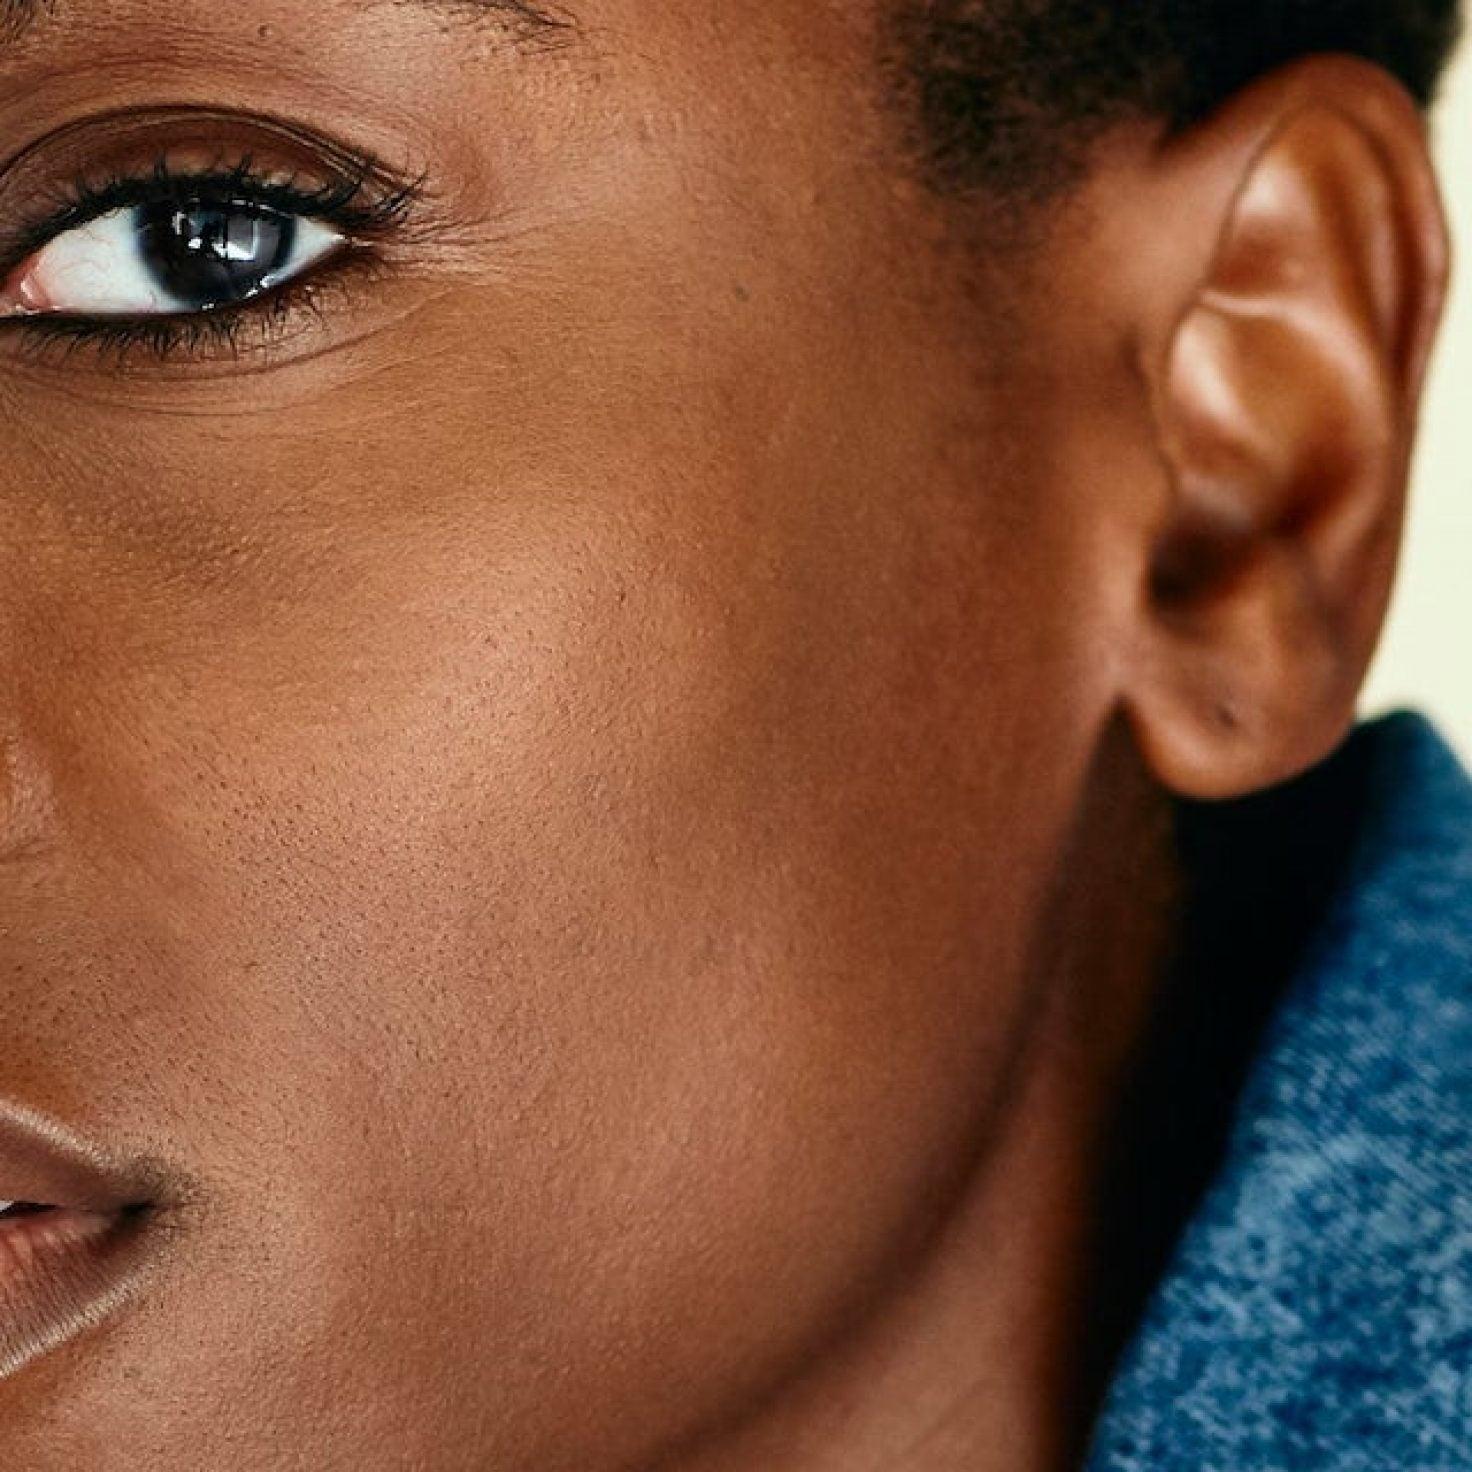 British Actress Tracy Ifeachor Wears God On Her Sleeve